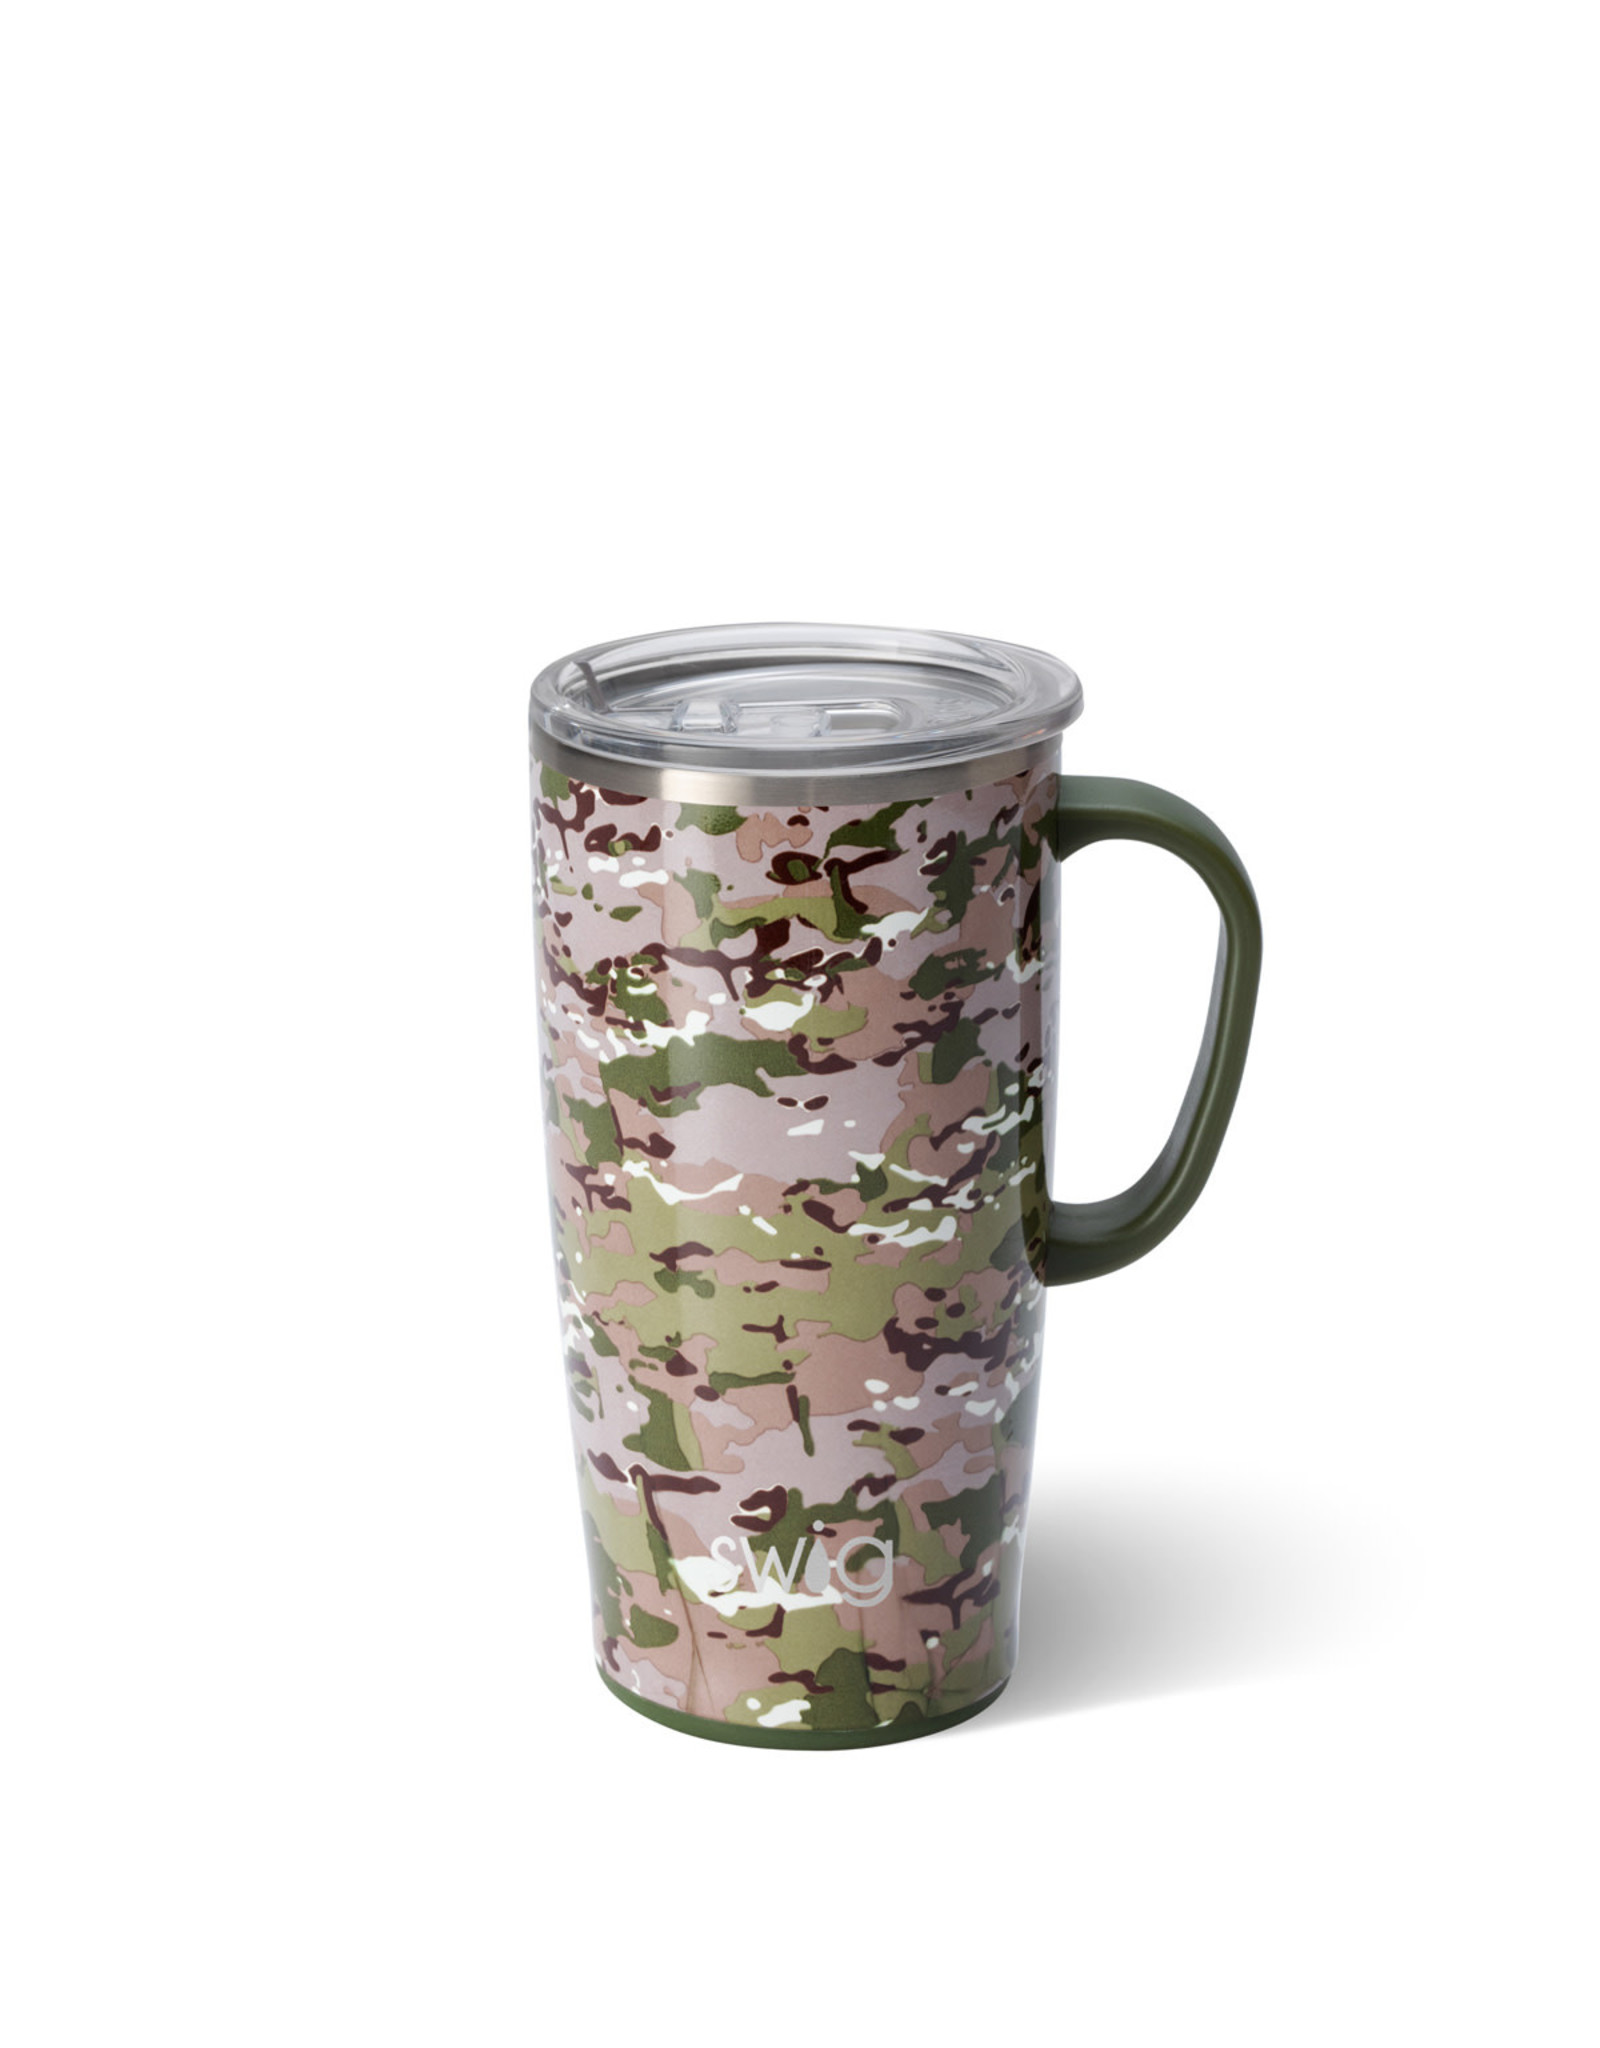 Duty Calls 22 oz mug